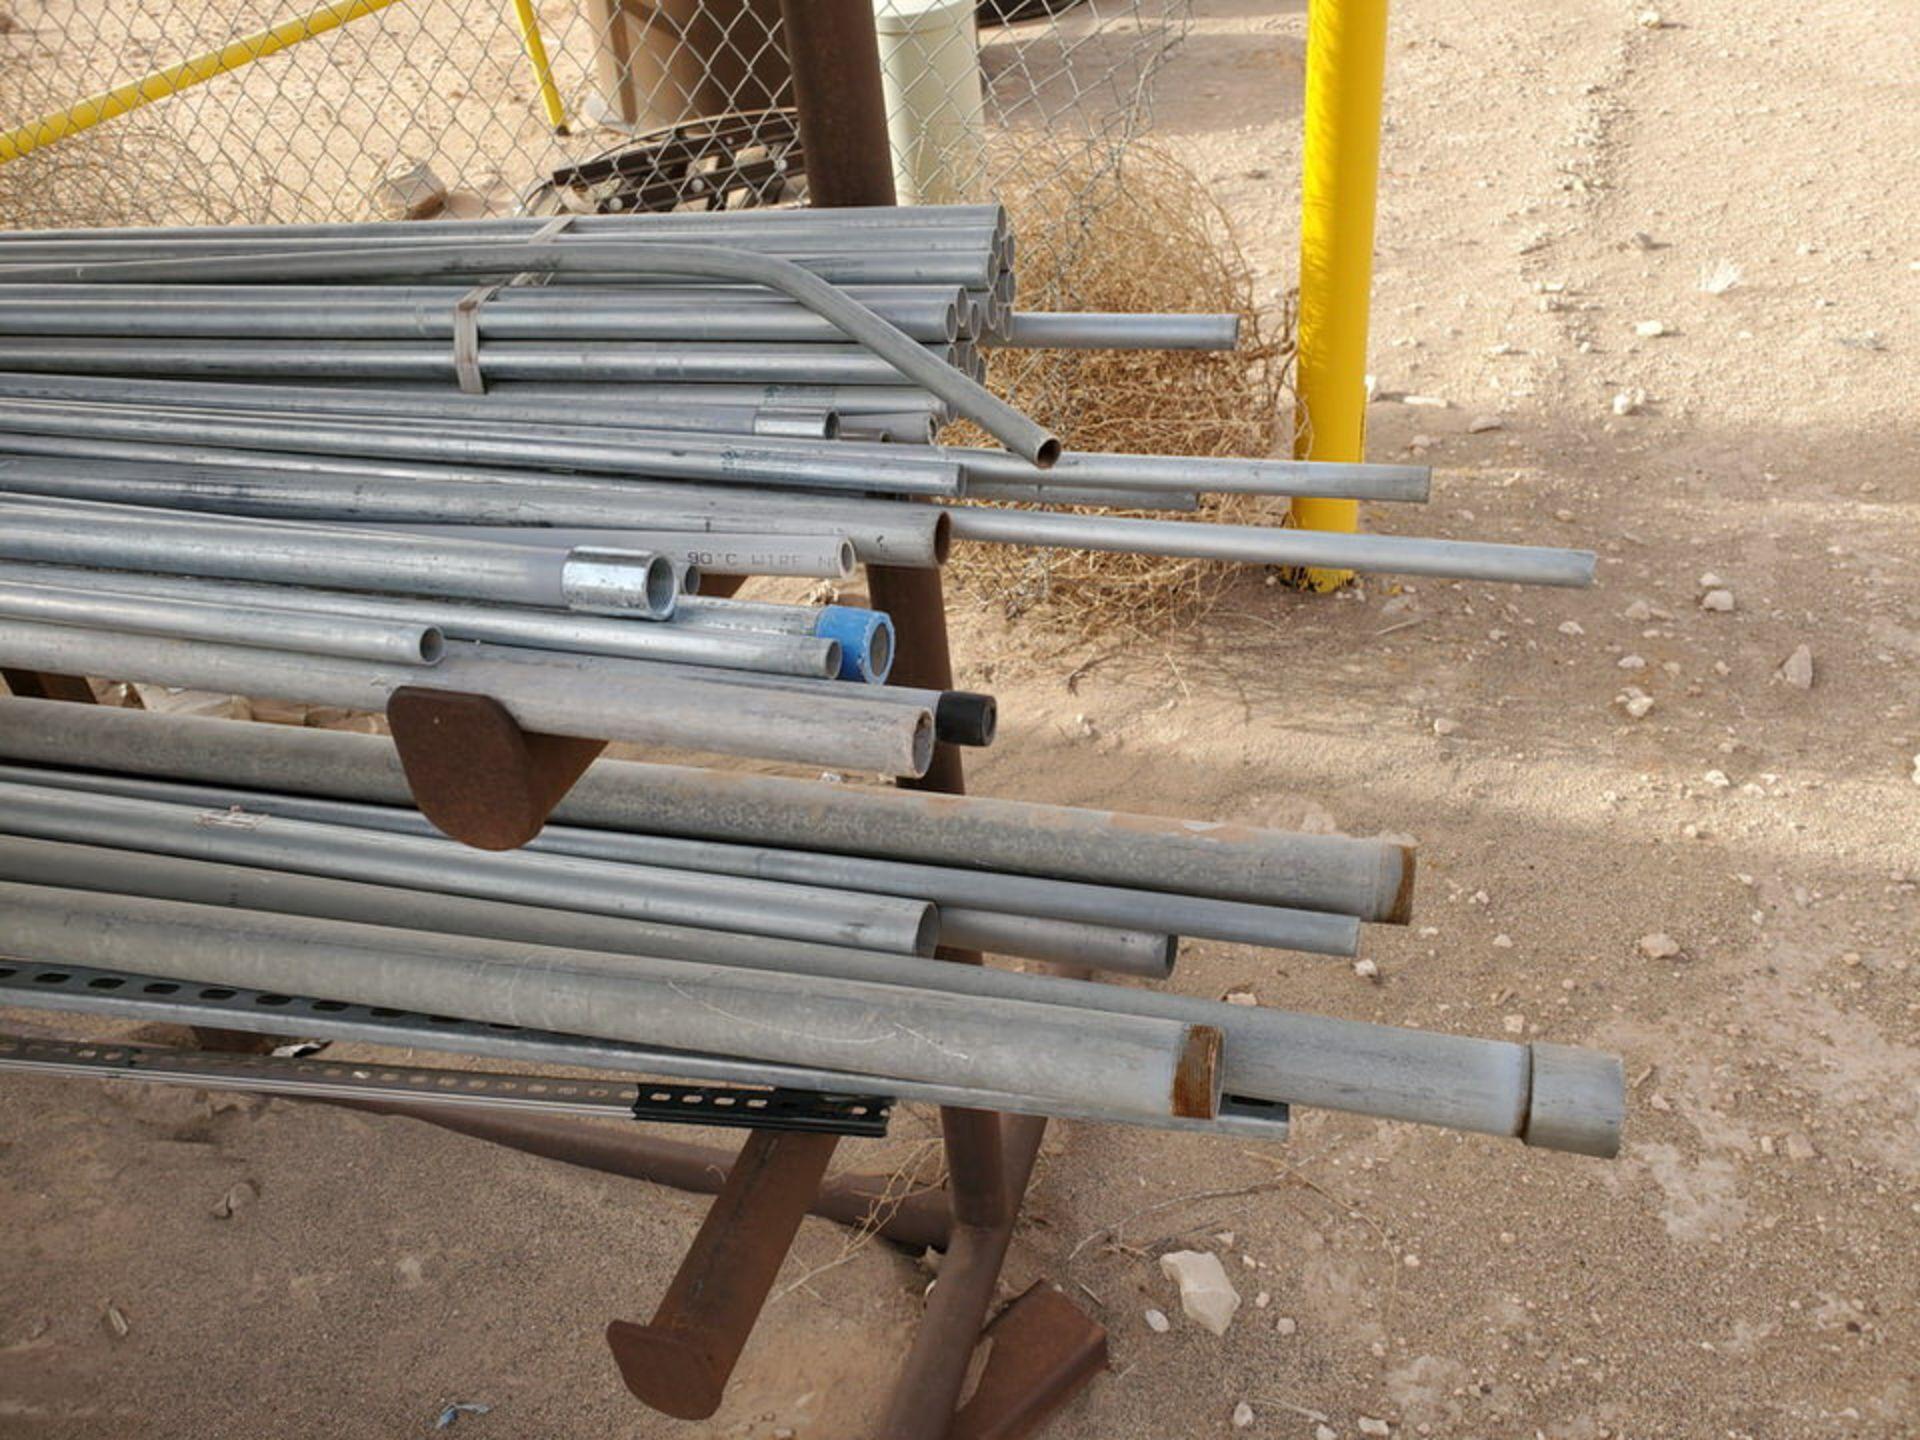 "PVC & Alum. Pipe W/ Conduit Size Range: 1/2"" - 4"" W/ Rack - Image 5 of 18"